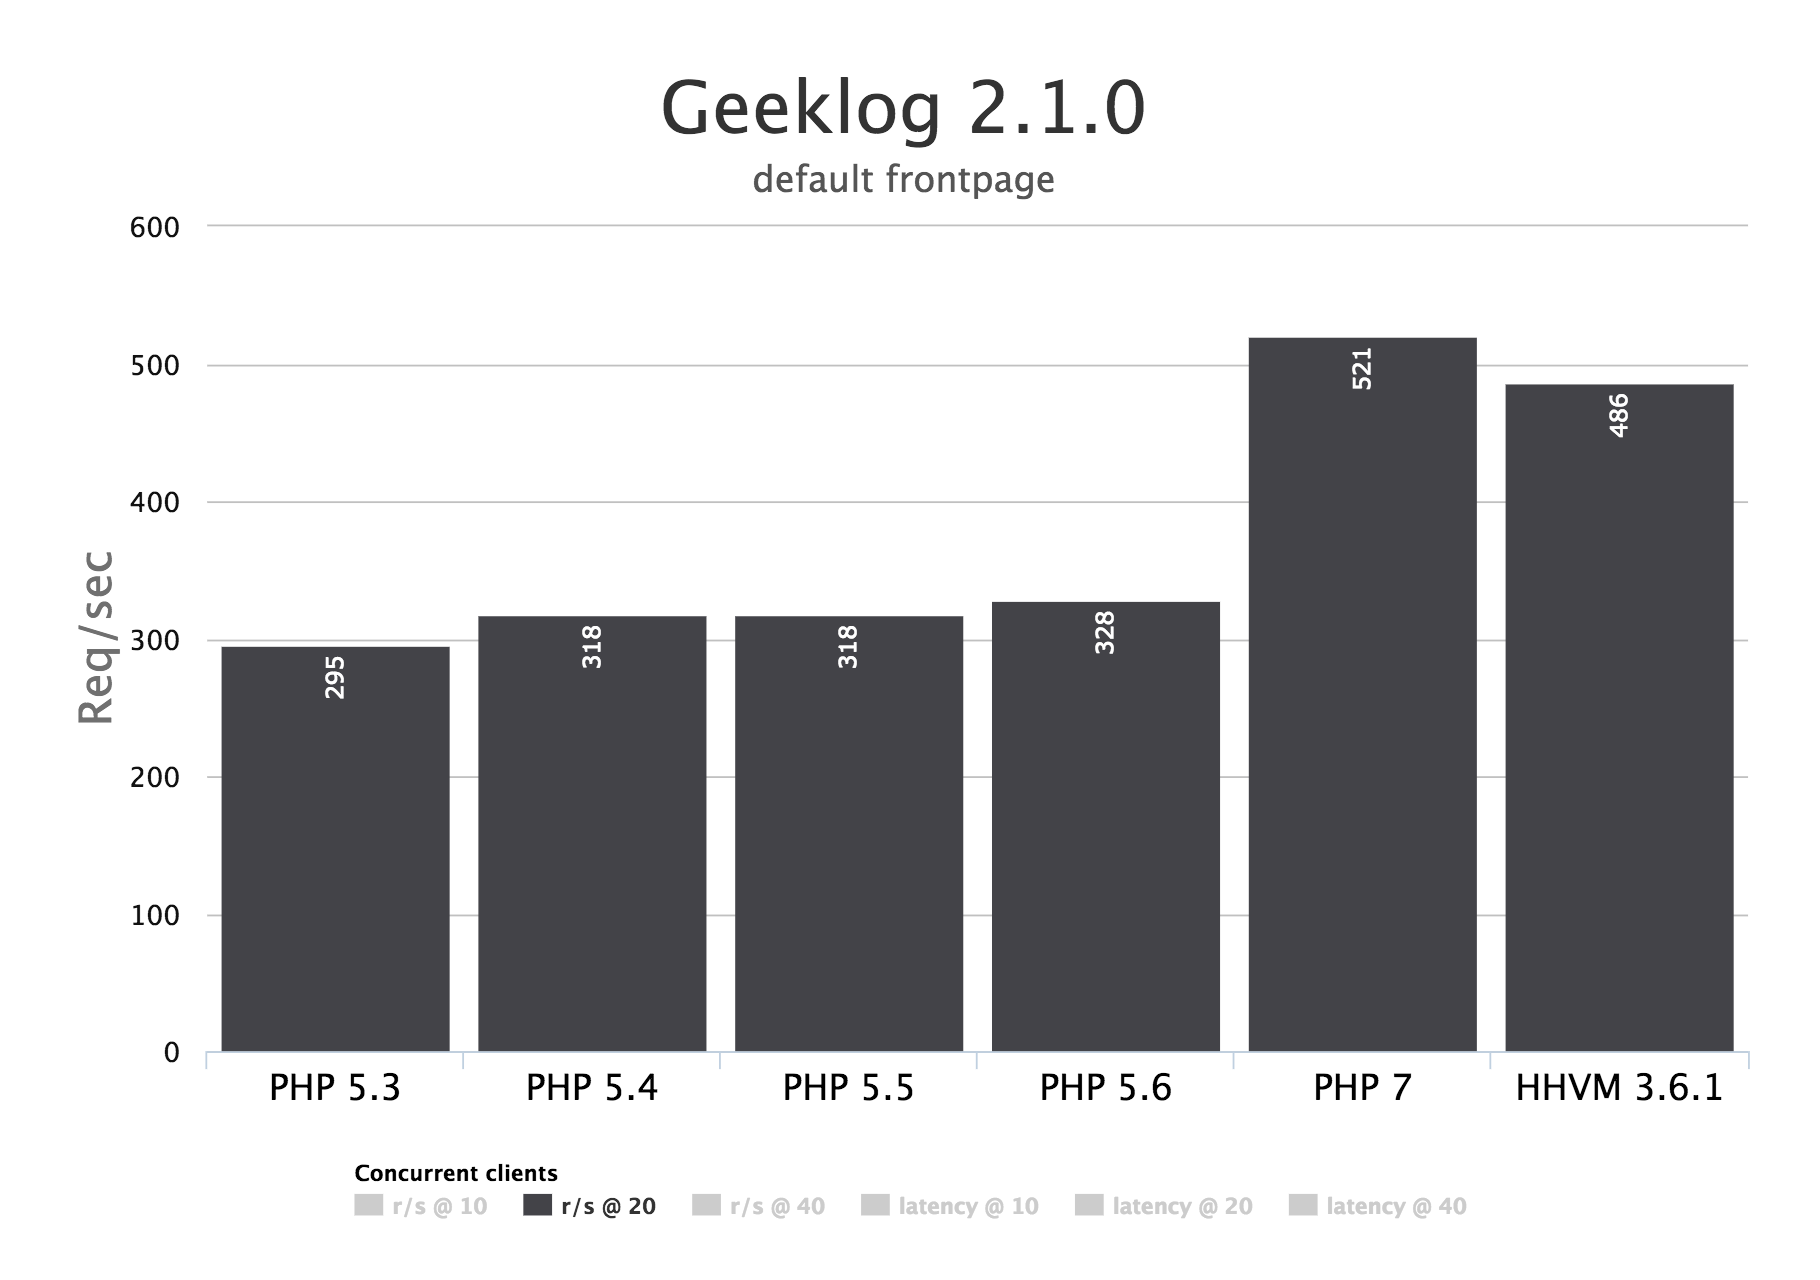 Geeklog 2.1.0